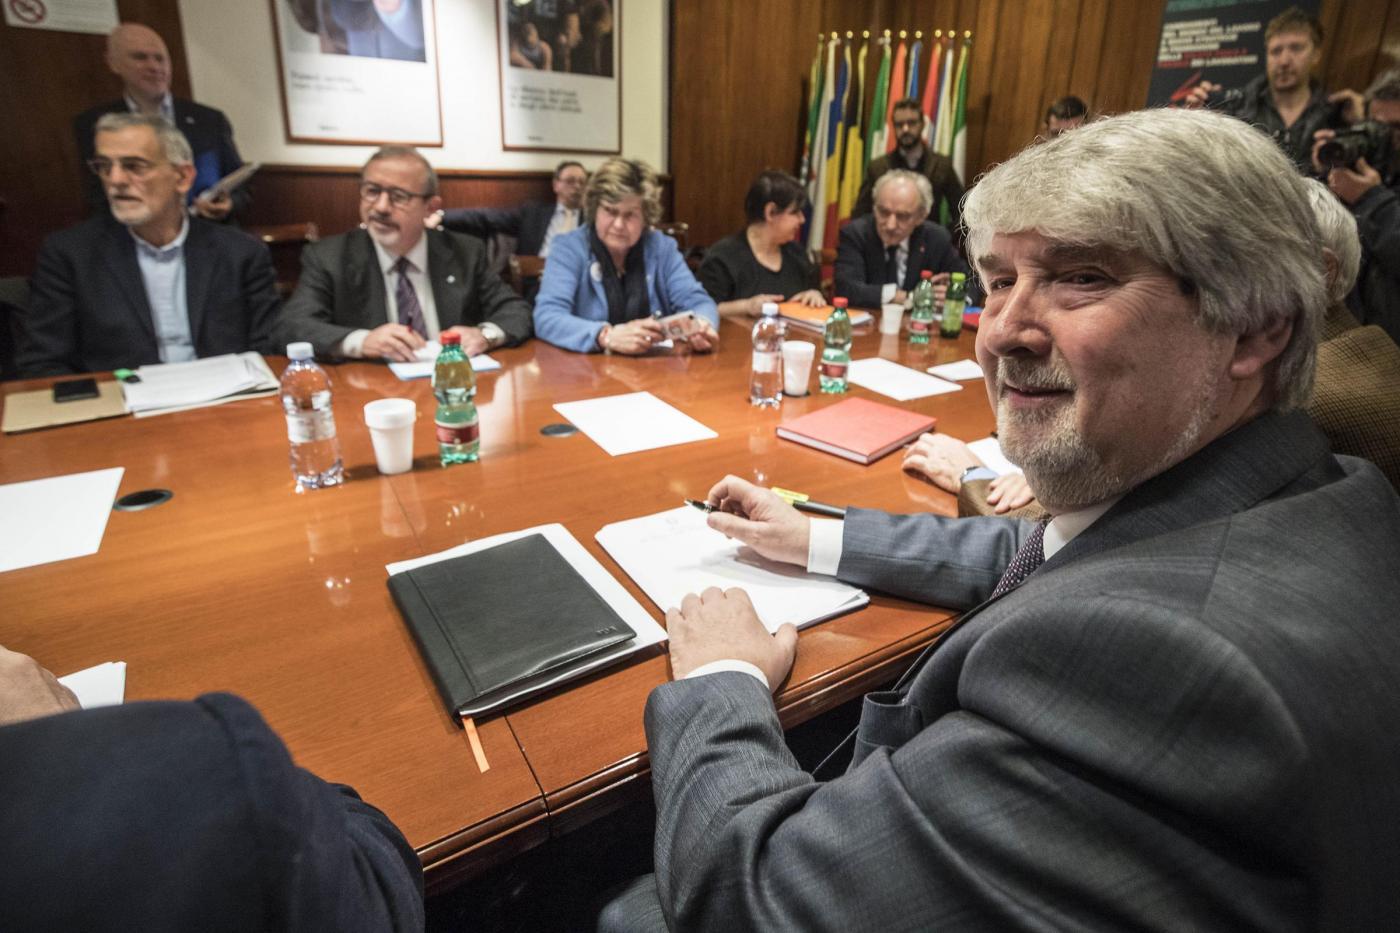 Pensioni anticipate news ultima ora - Poletti incontra i sindacati